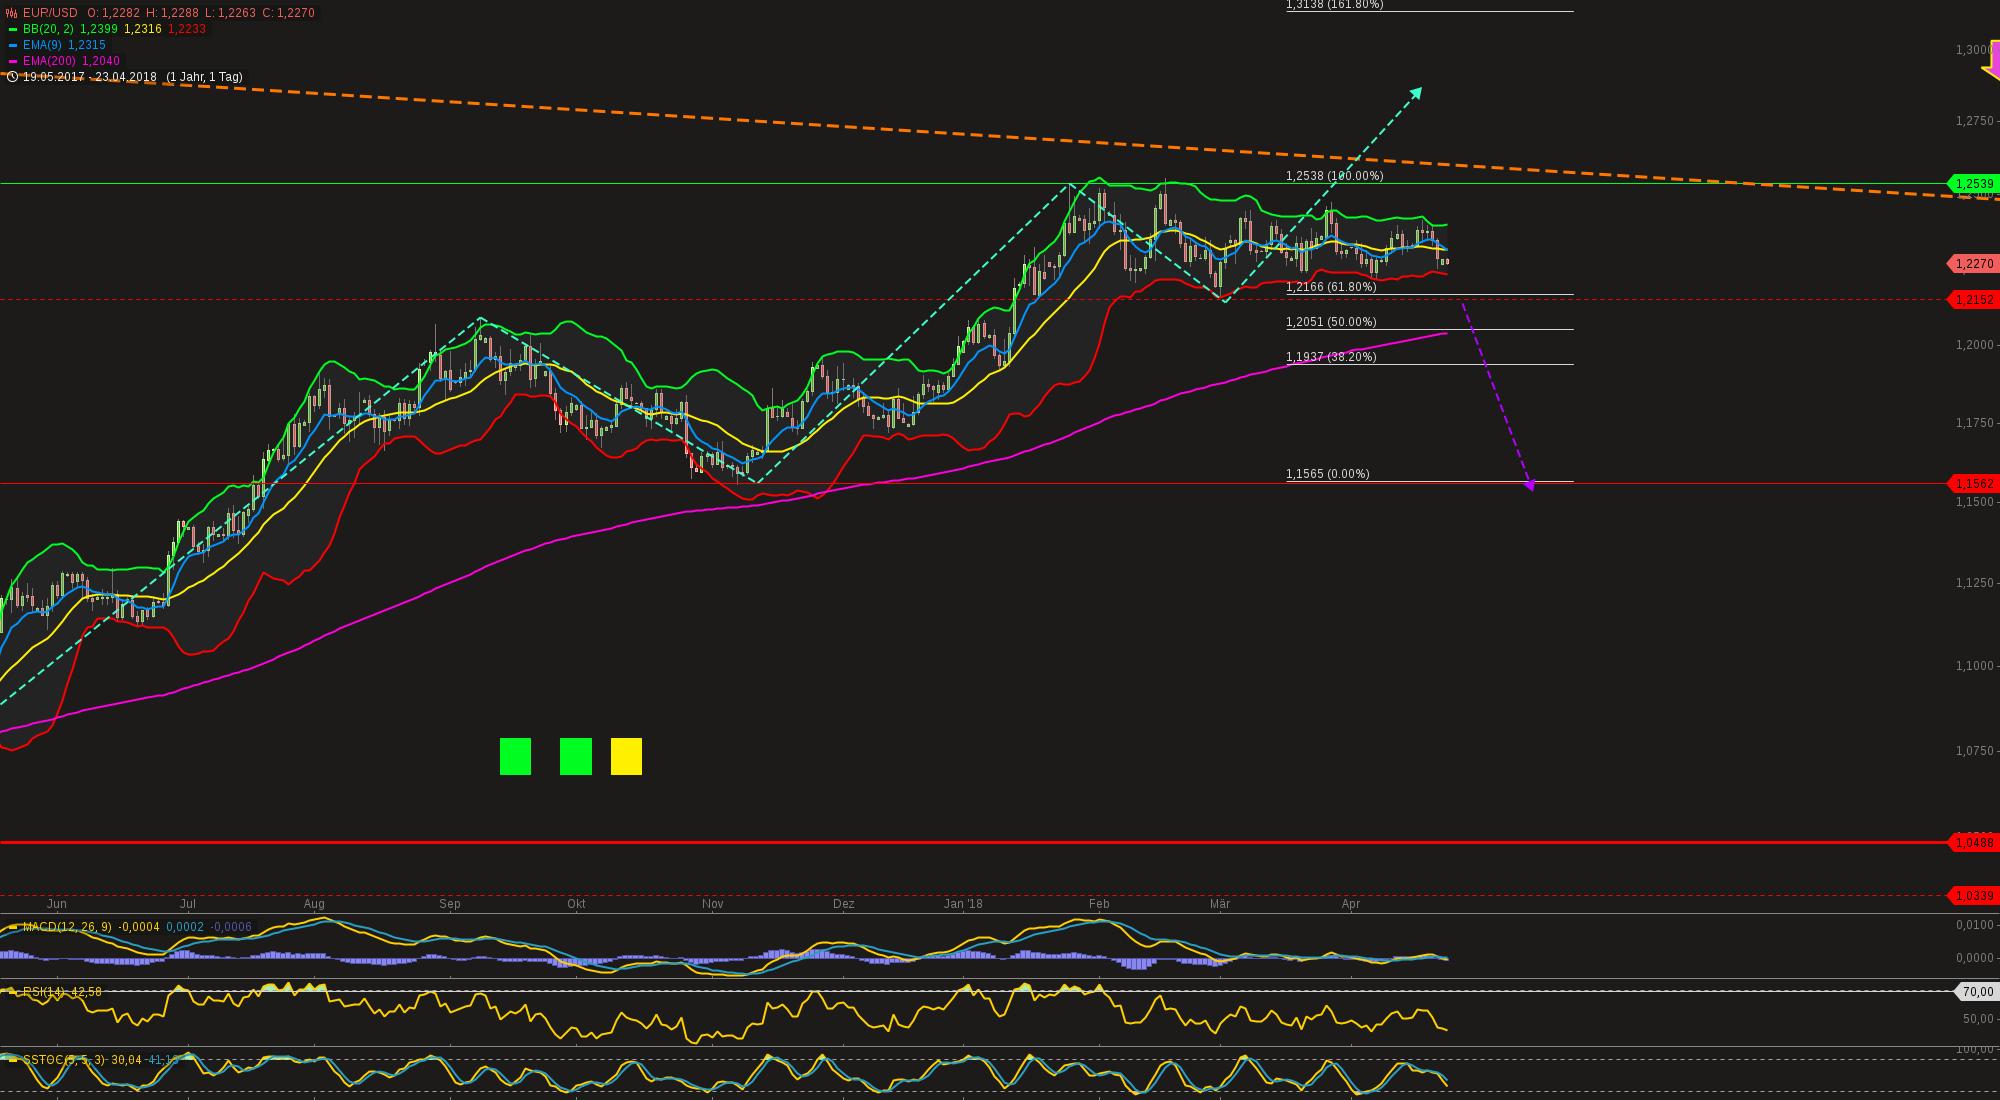 chart-23042018-0838-eurusd.png